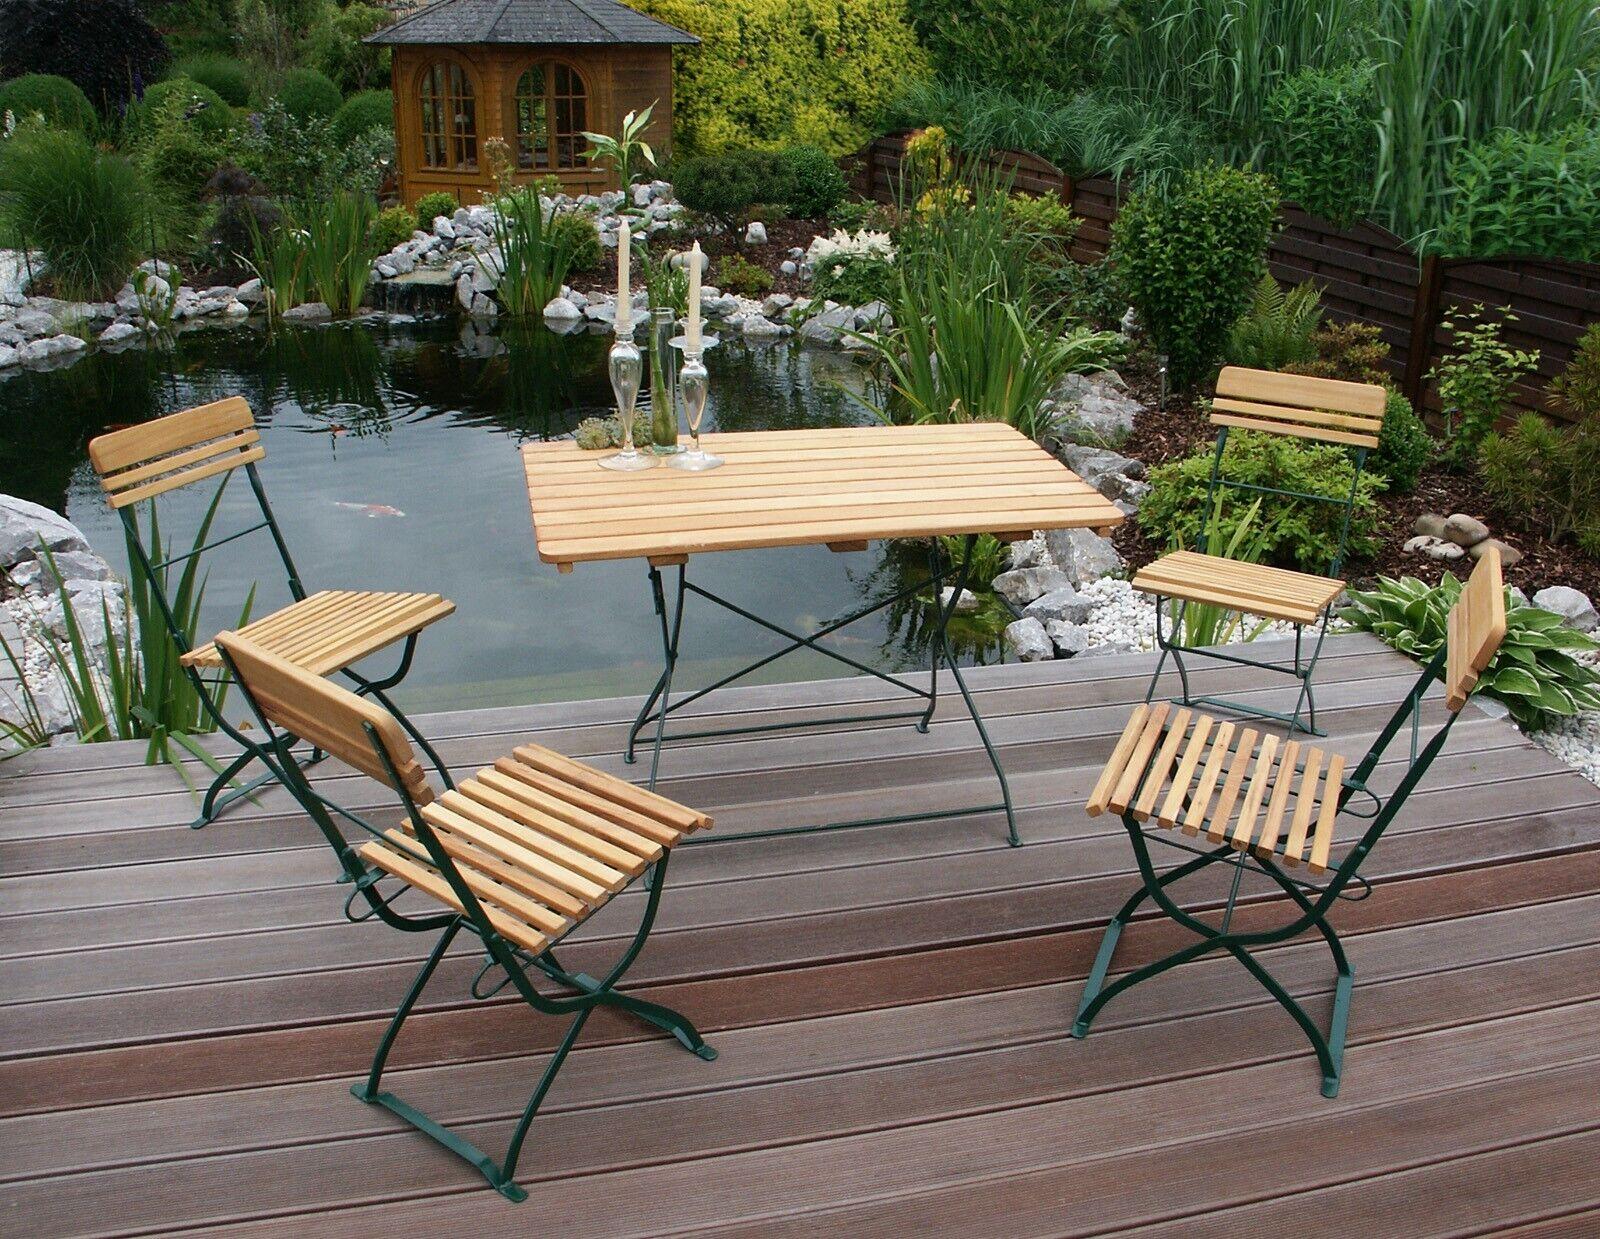 Garnitur MÜNCHEN 5 teilig Flachstahl Sitzgruppe Grün Tisch Stühle Robinenholz Robinenholz Robinenholz b2b205